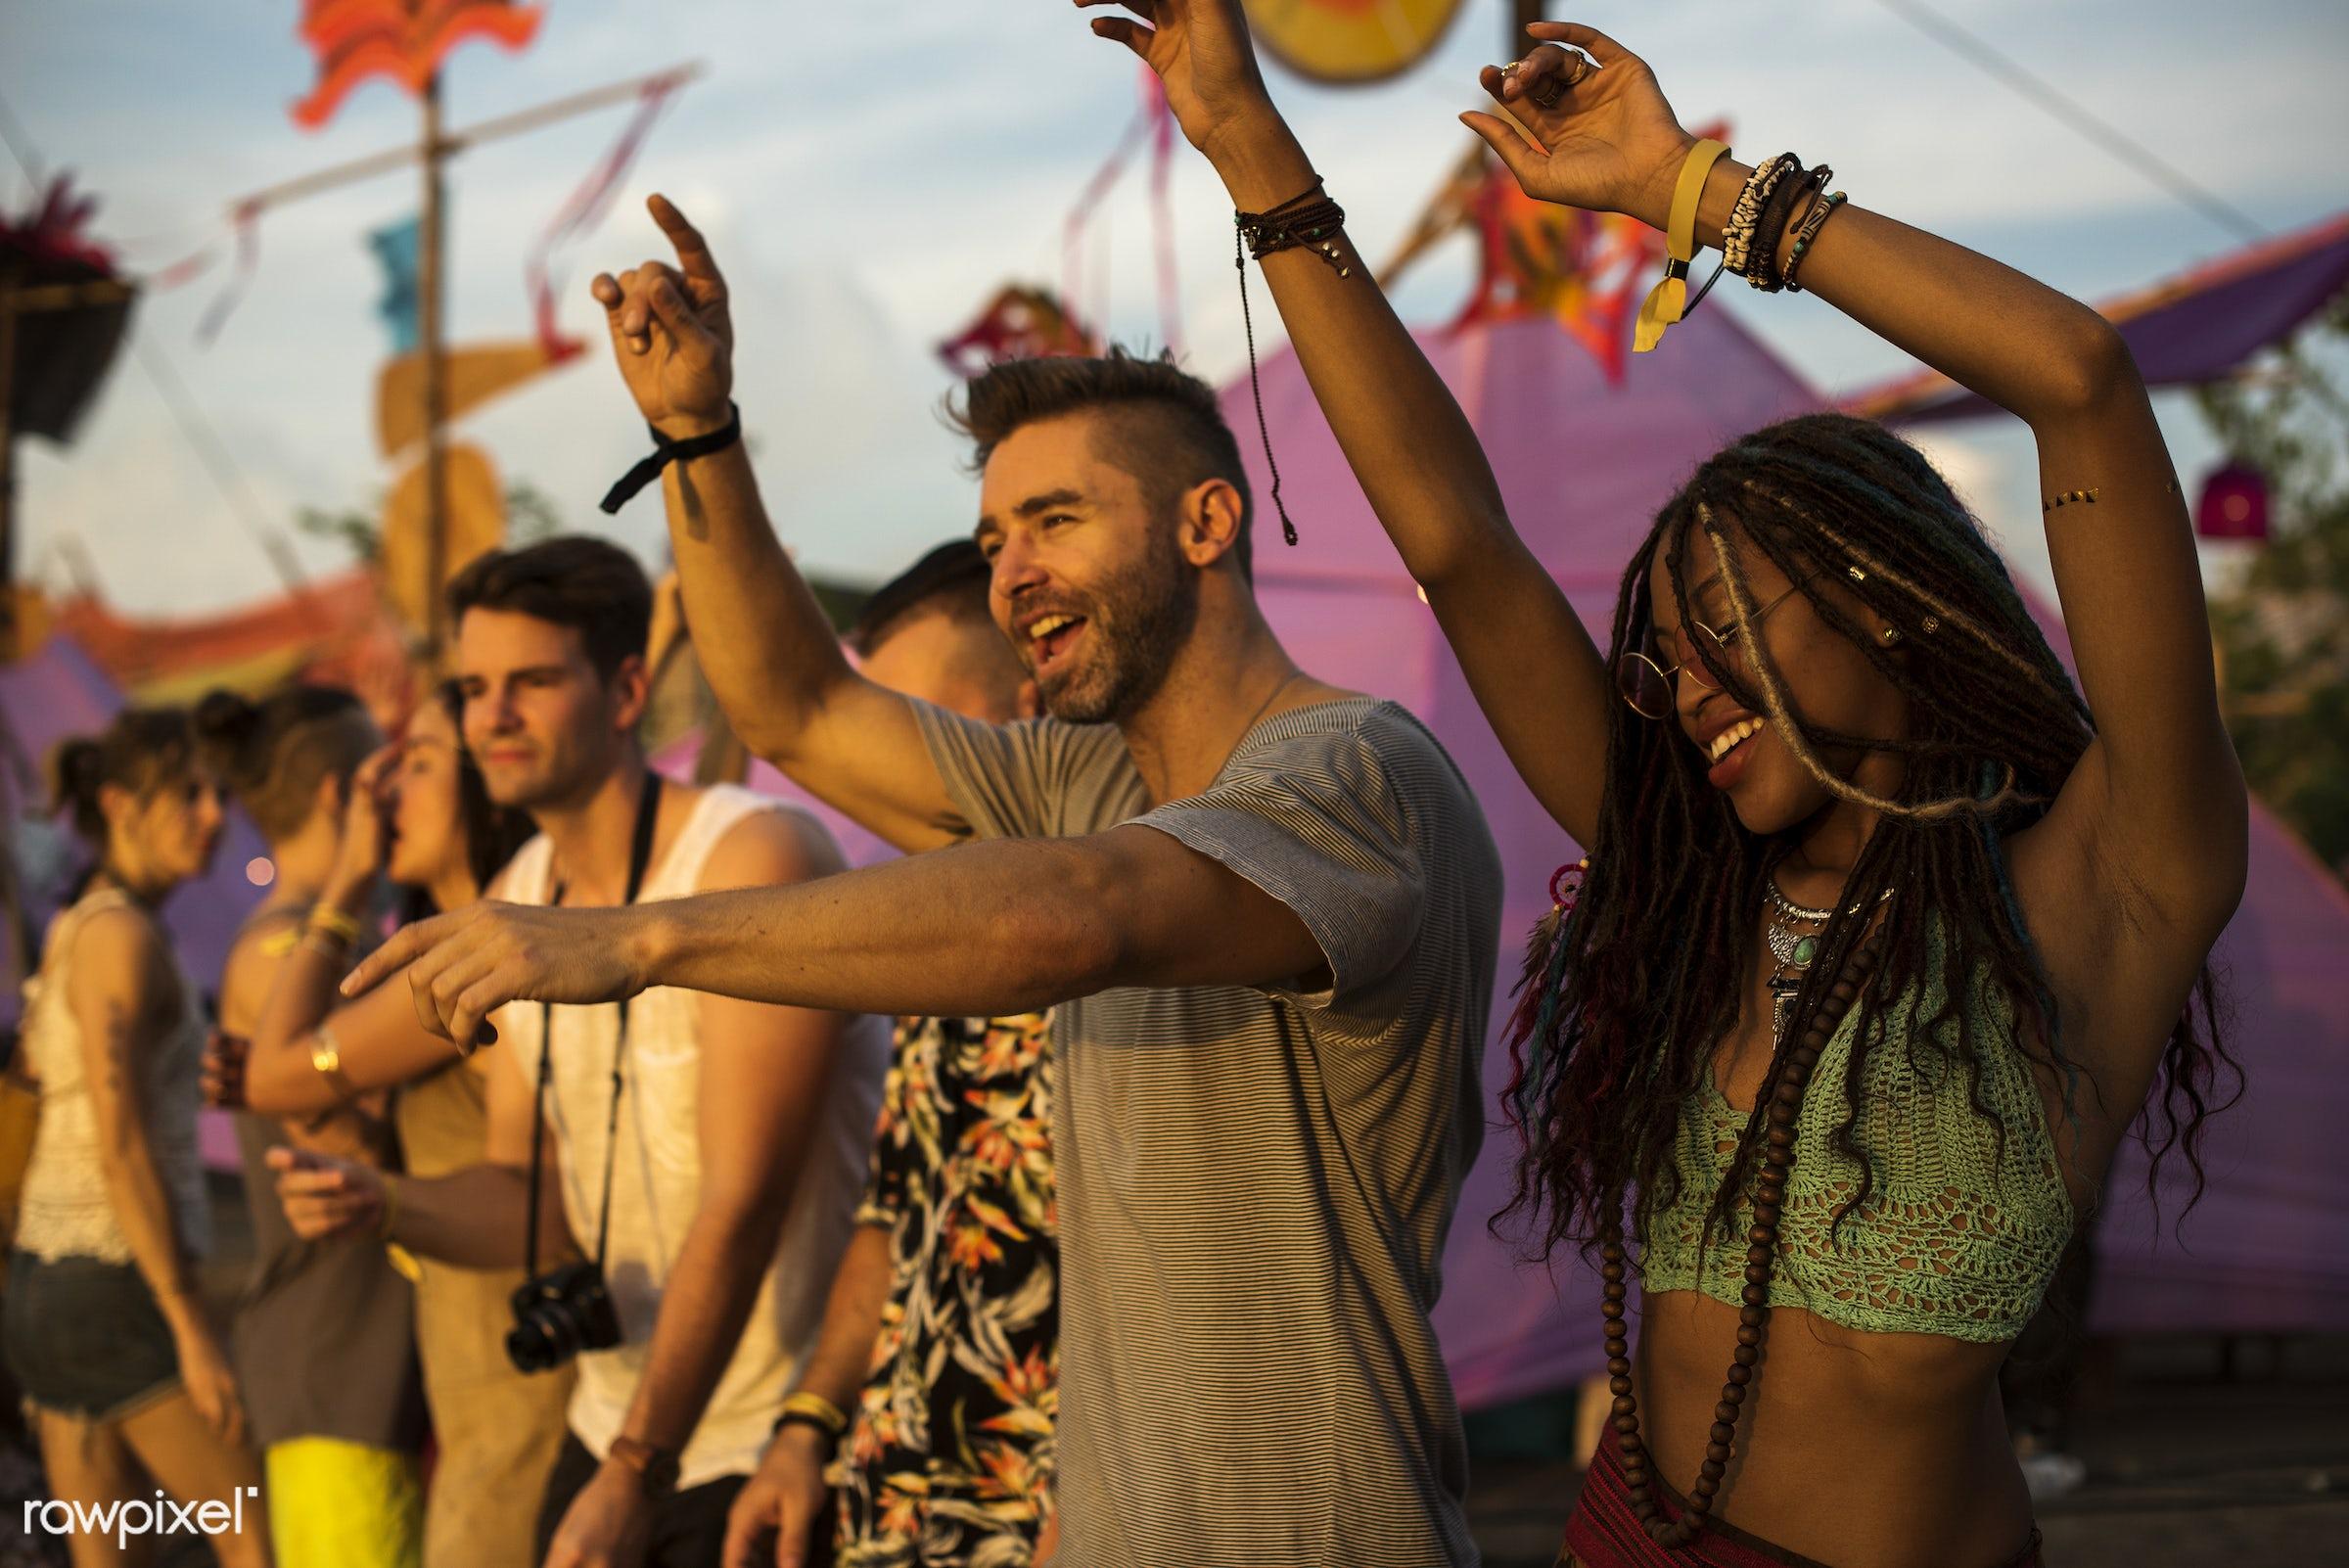 activity, adults, carefree, concert, crowd, diversity, enjoying, enjoyment, entertainment, event, festival, friends,...